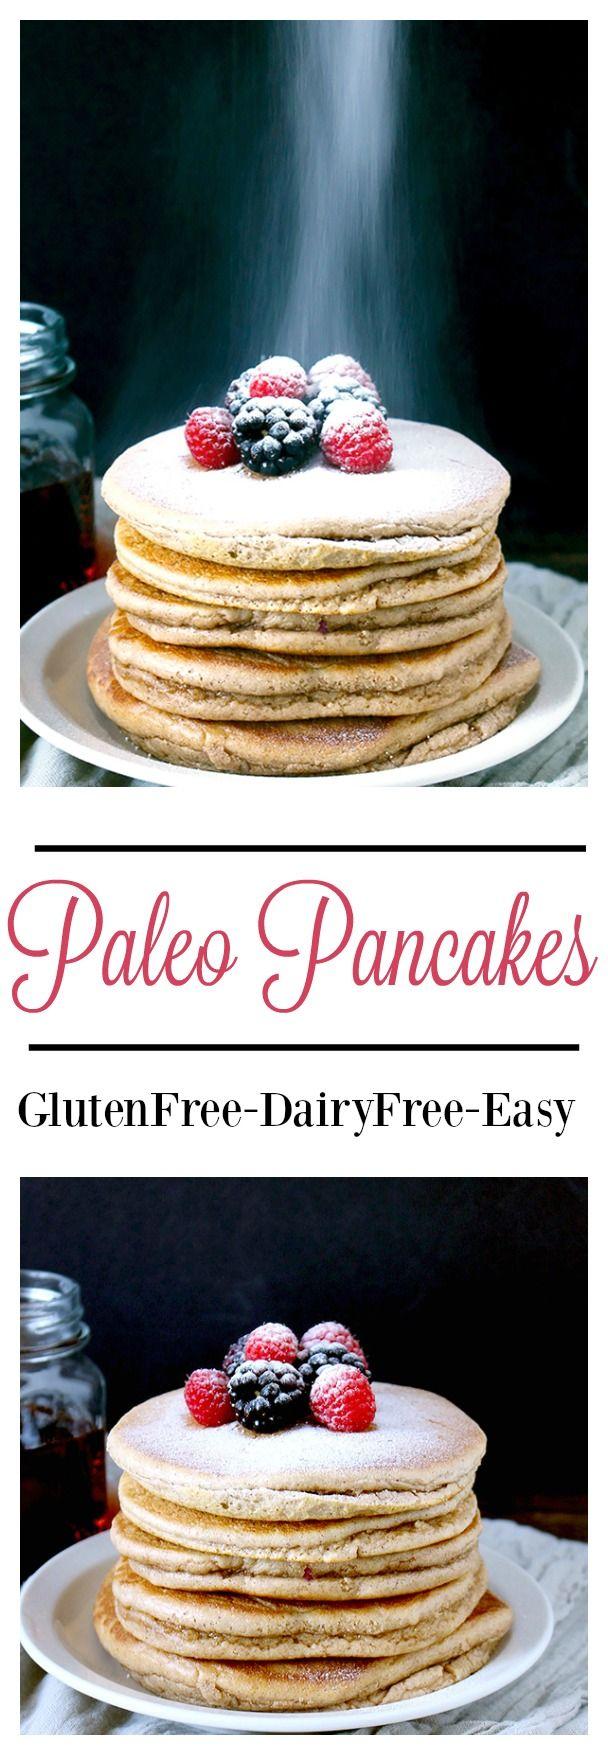 Paleo Pancakes- 6 ingredients, super easy, and taste just like regular pancakes. Gluten free, dairy free, and healthy!